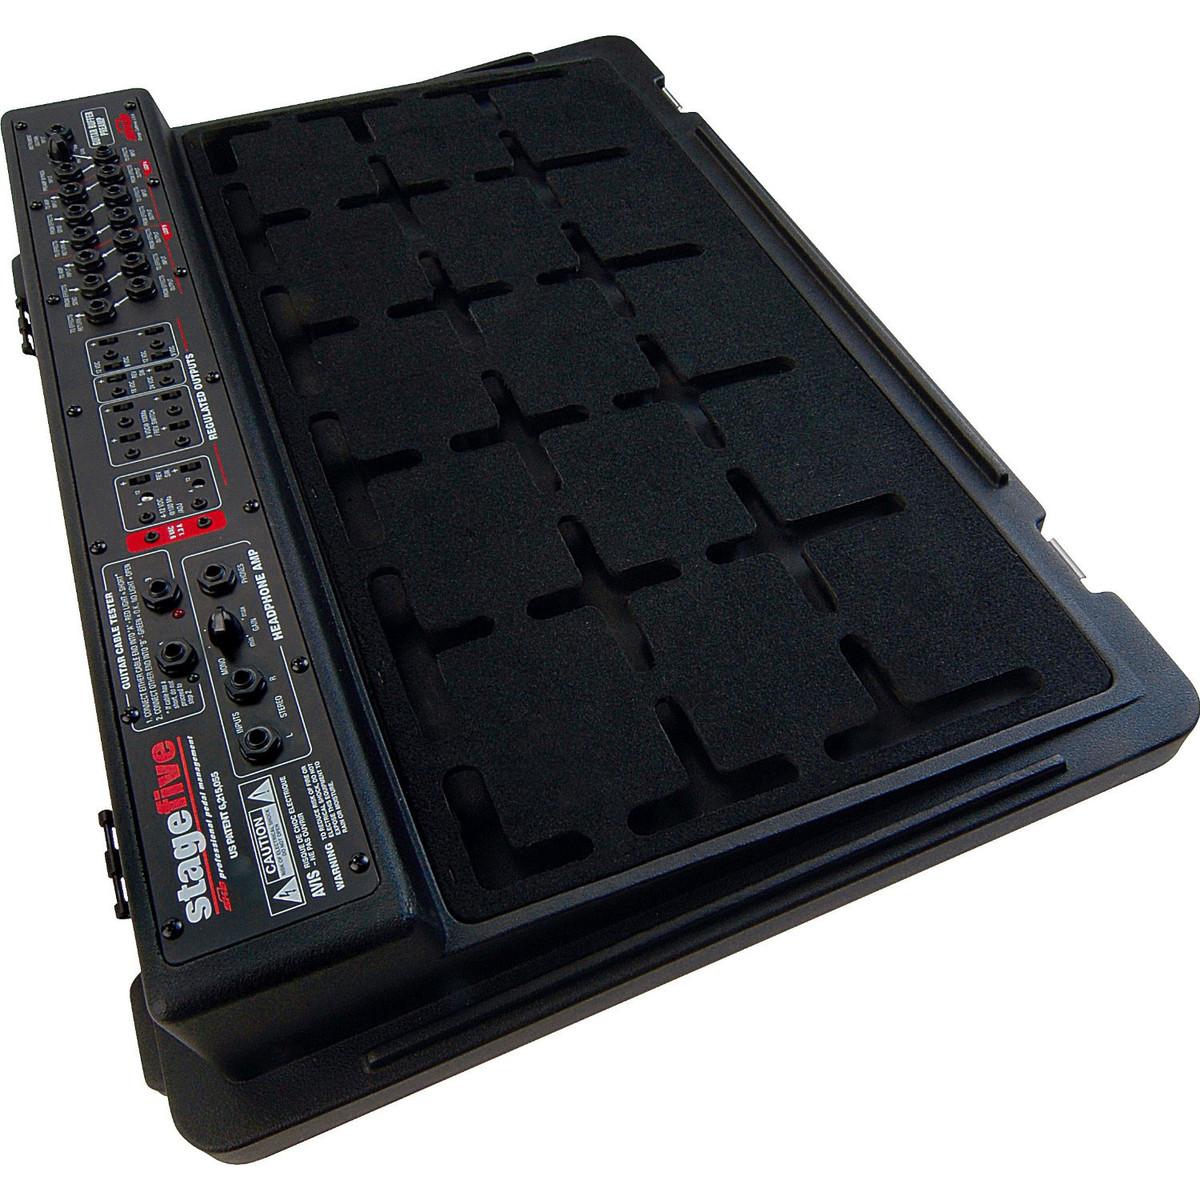 Disc Skb Stagefive Professional Pedal Board System Eu